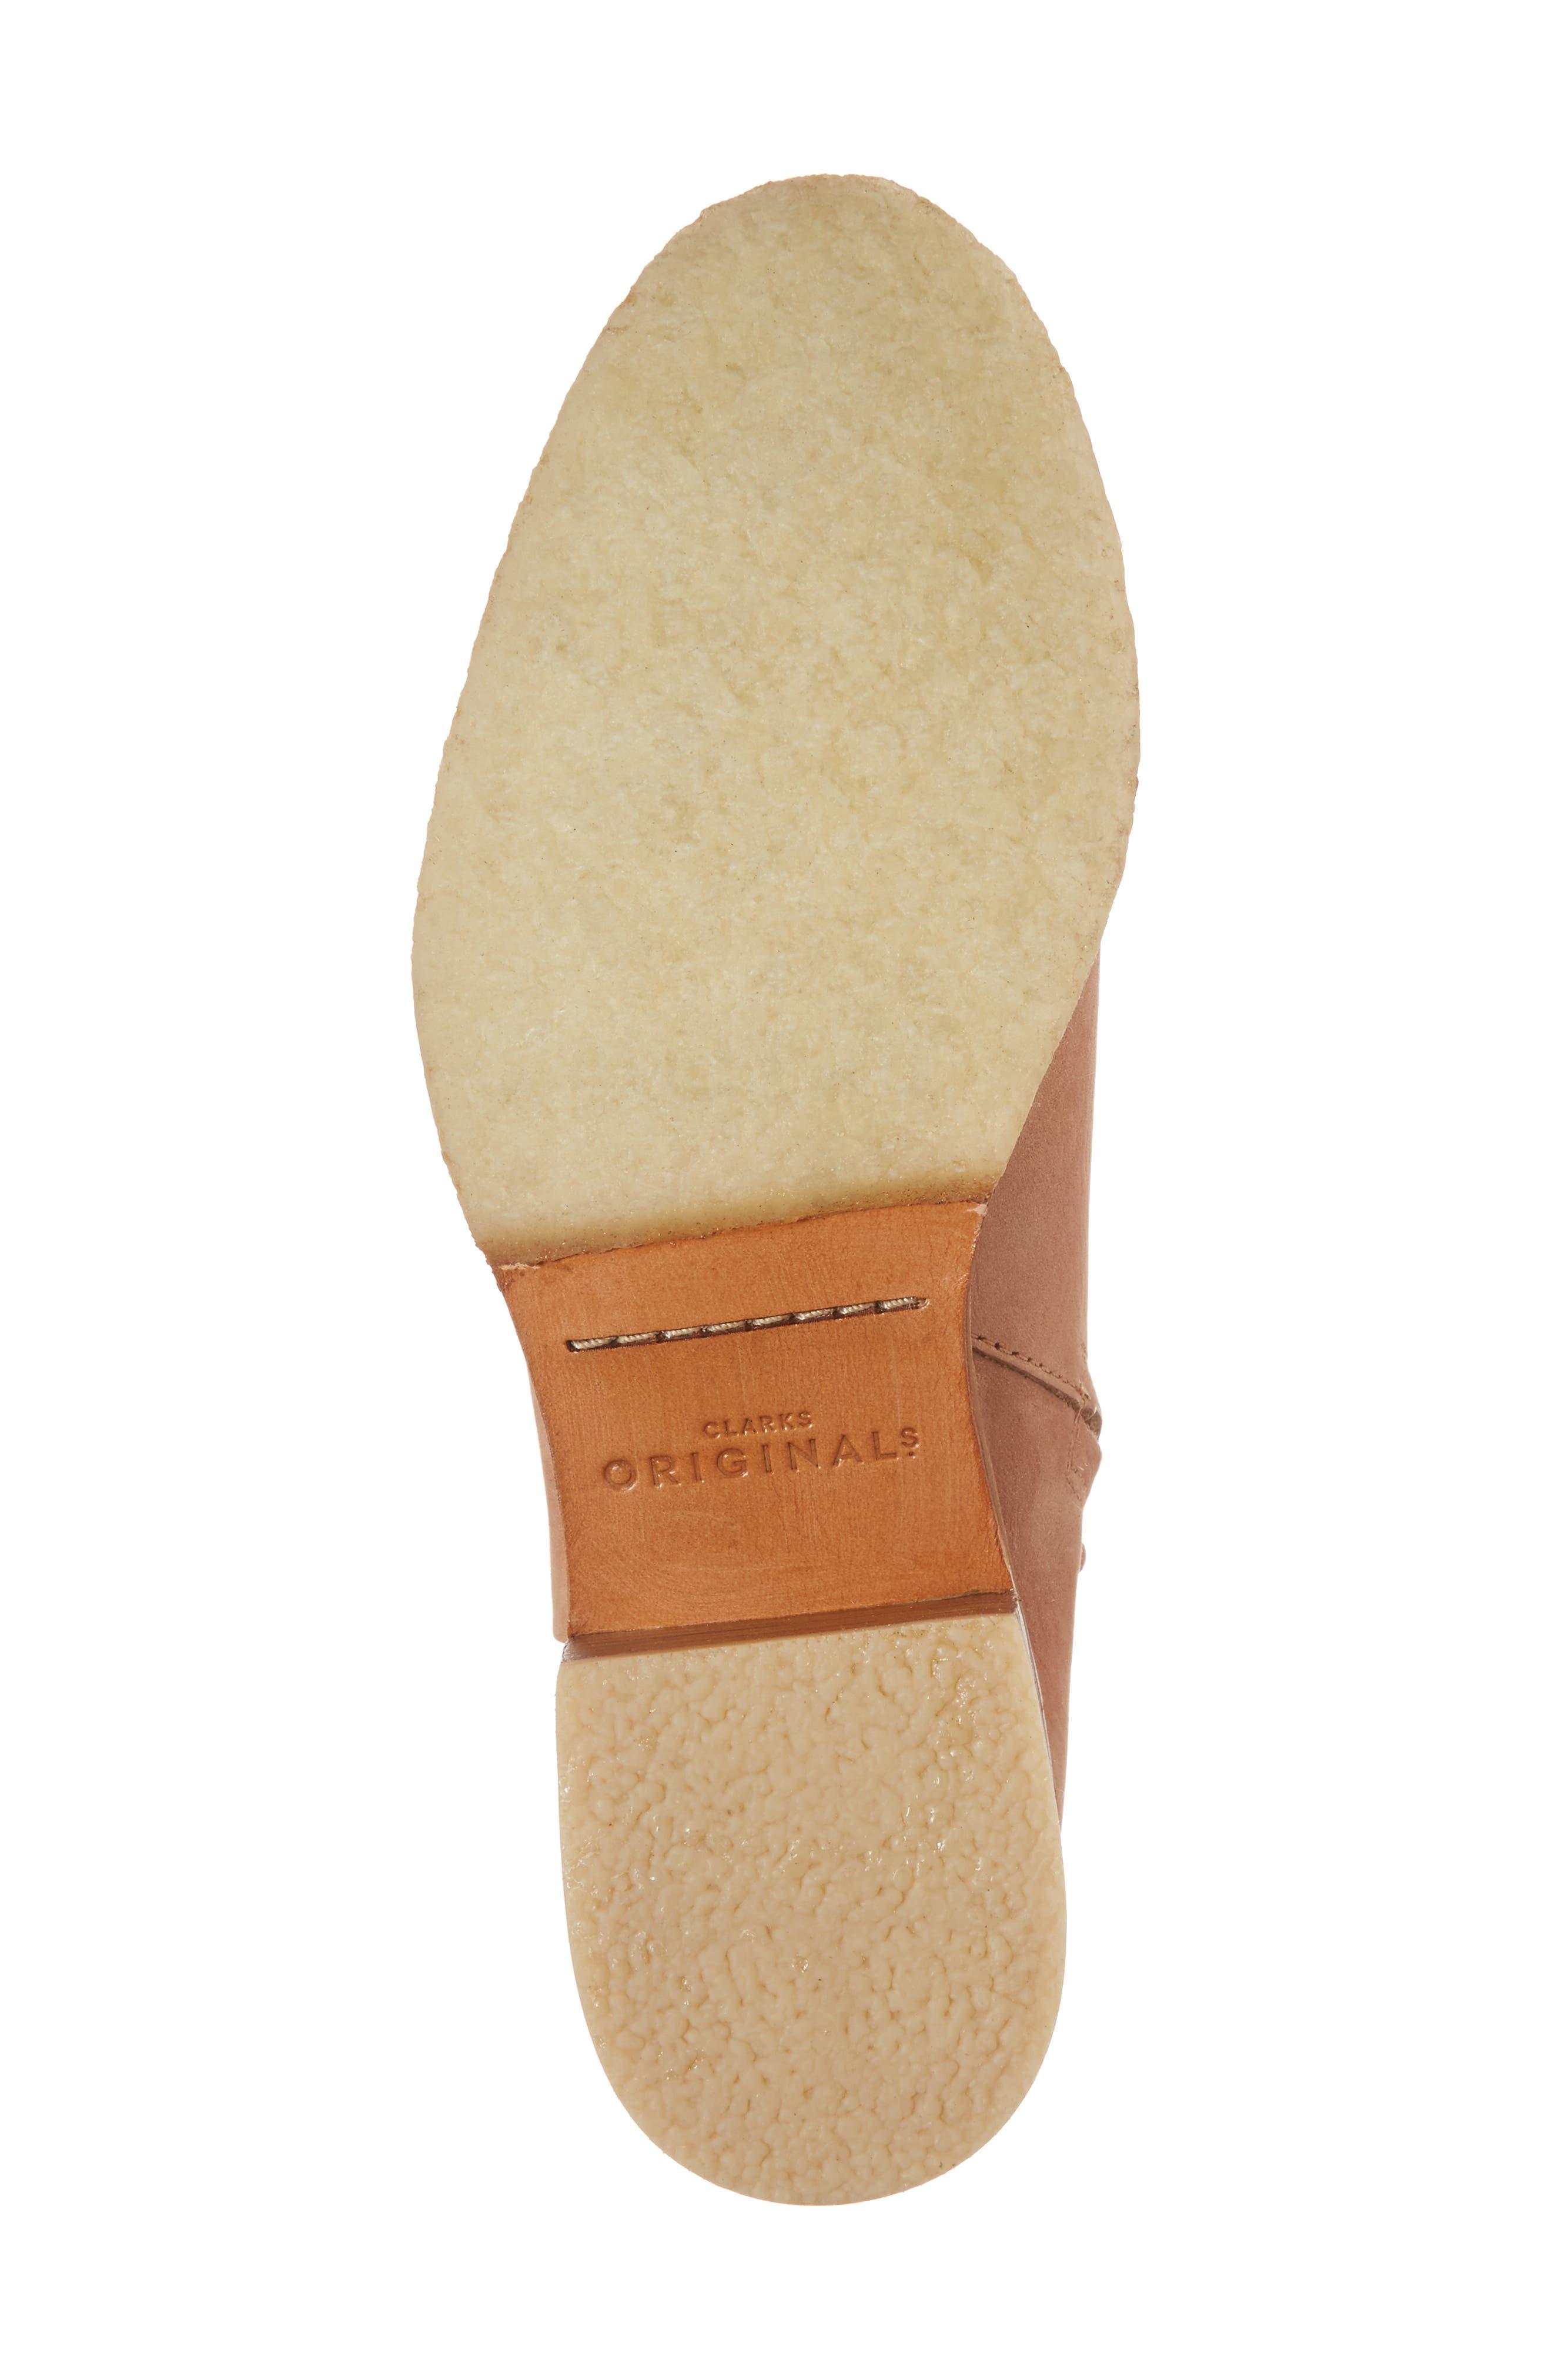 Amara Water Resistant Block Heel Bootie,                             Alternate thumbnail 6, color,                             SANDSTONE NUBUCK LEATHER